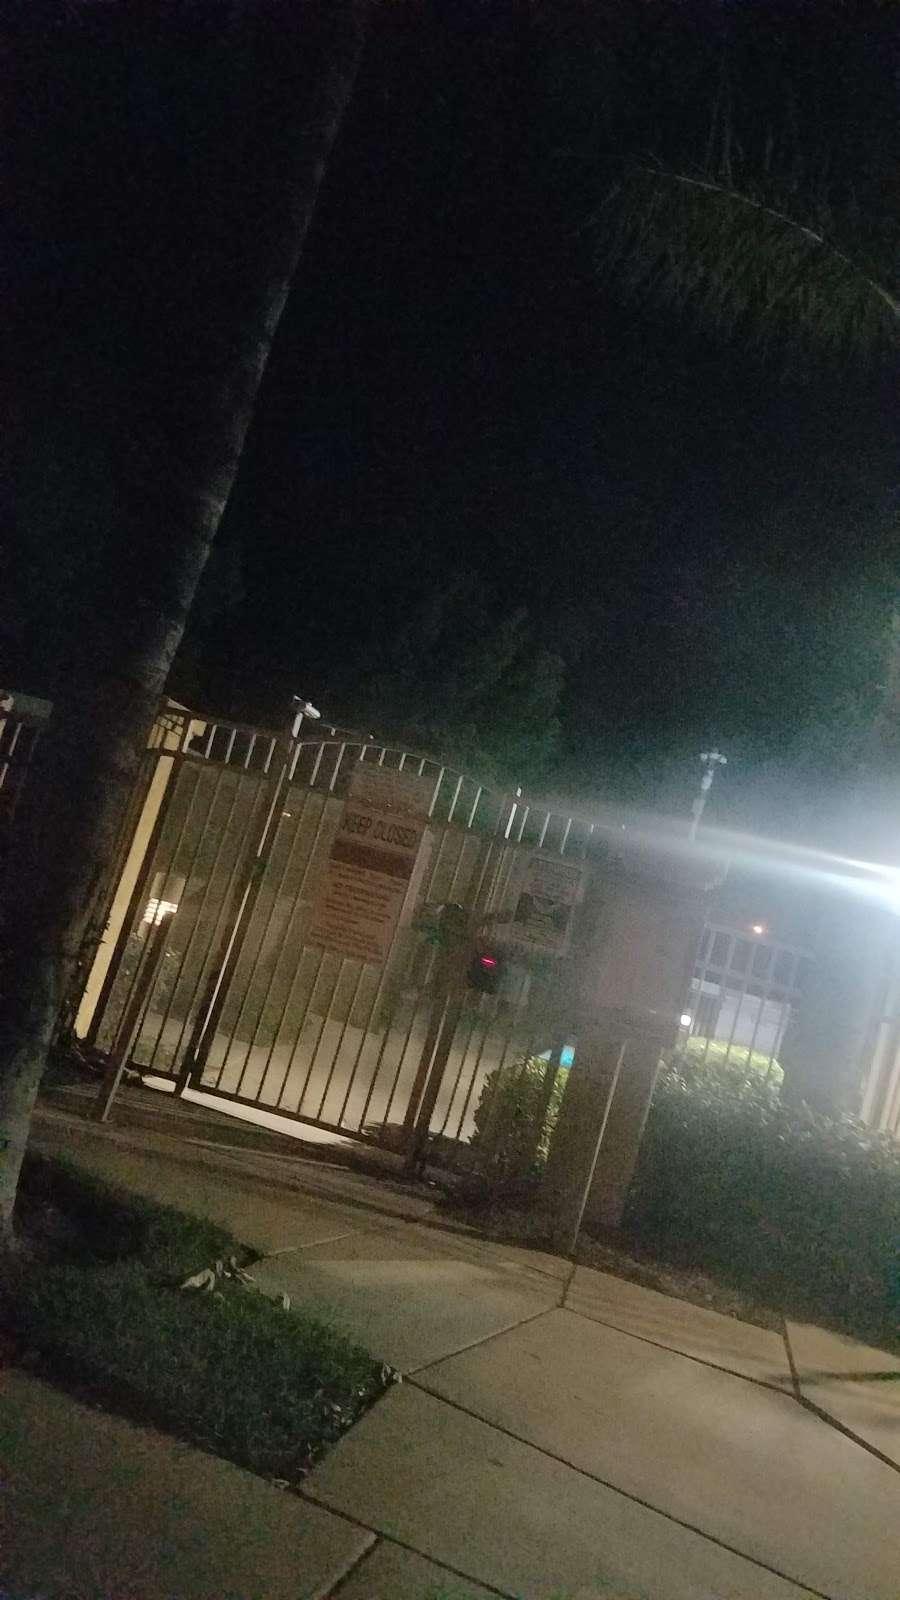 Paloma del Sol Rec 3 - park  | Photo 3 of 5 | Address: 31760 Calle Vimianzo, Temecula, CA 92592, USA